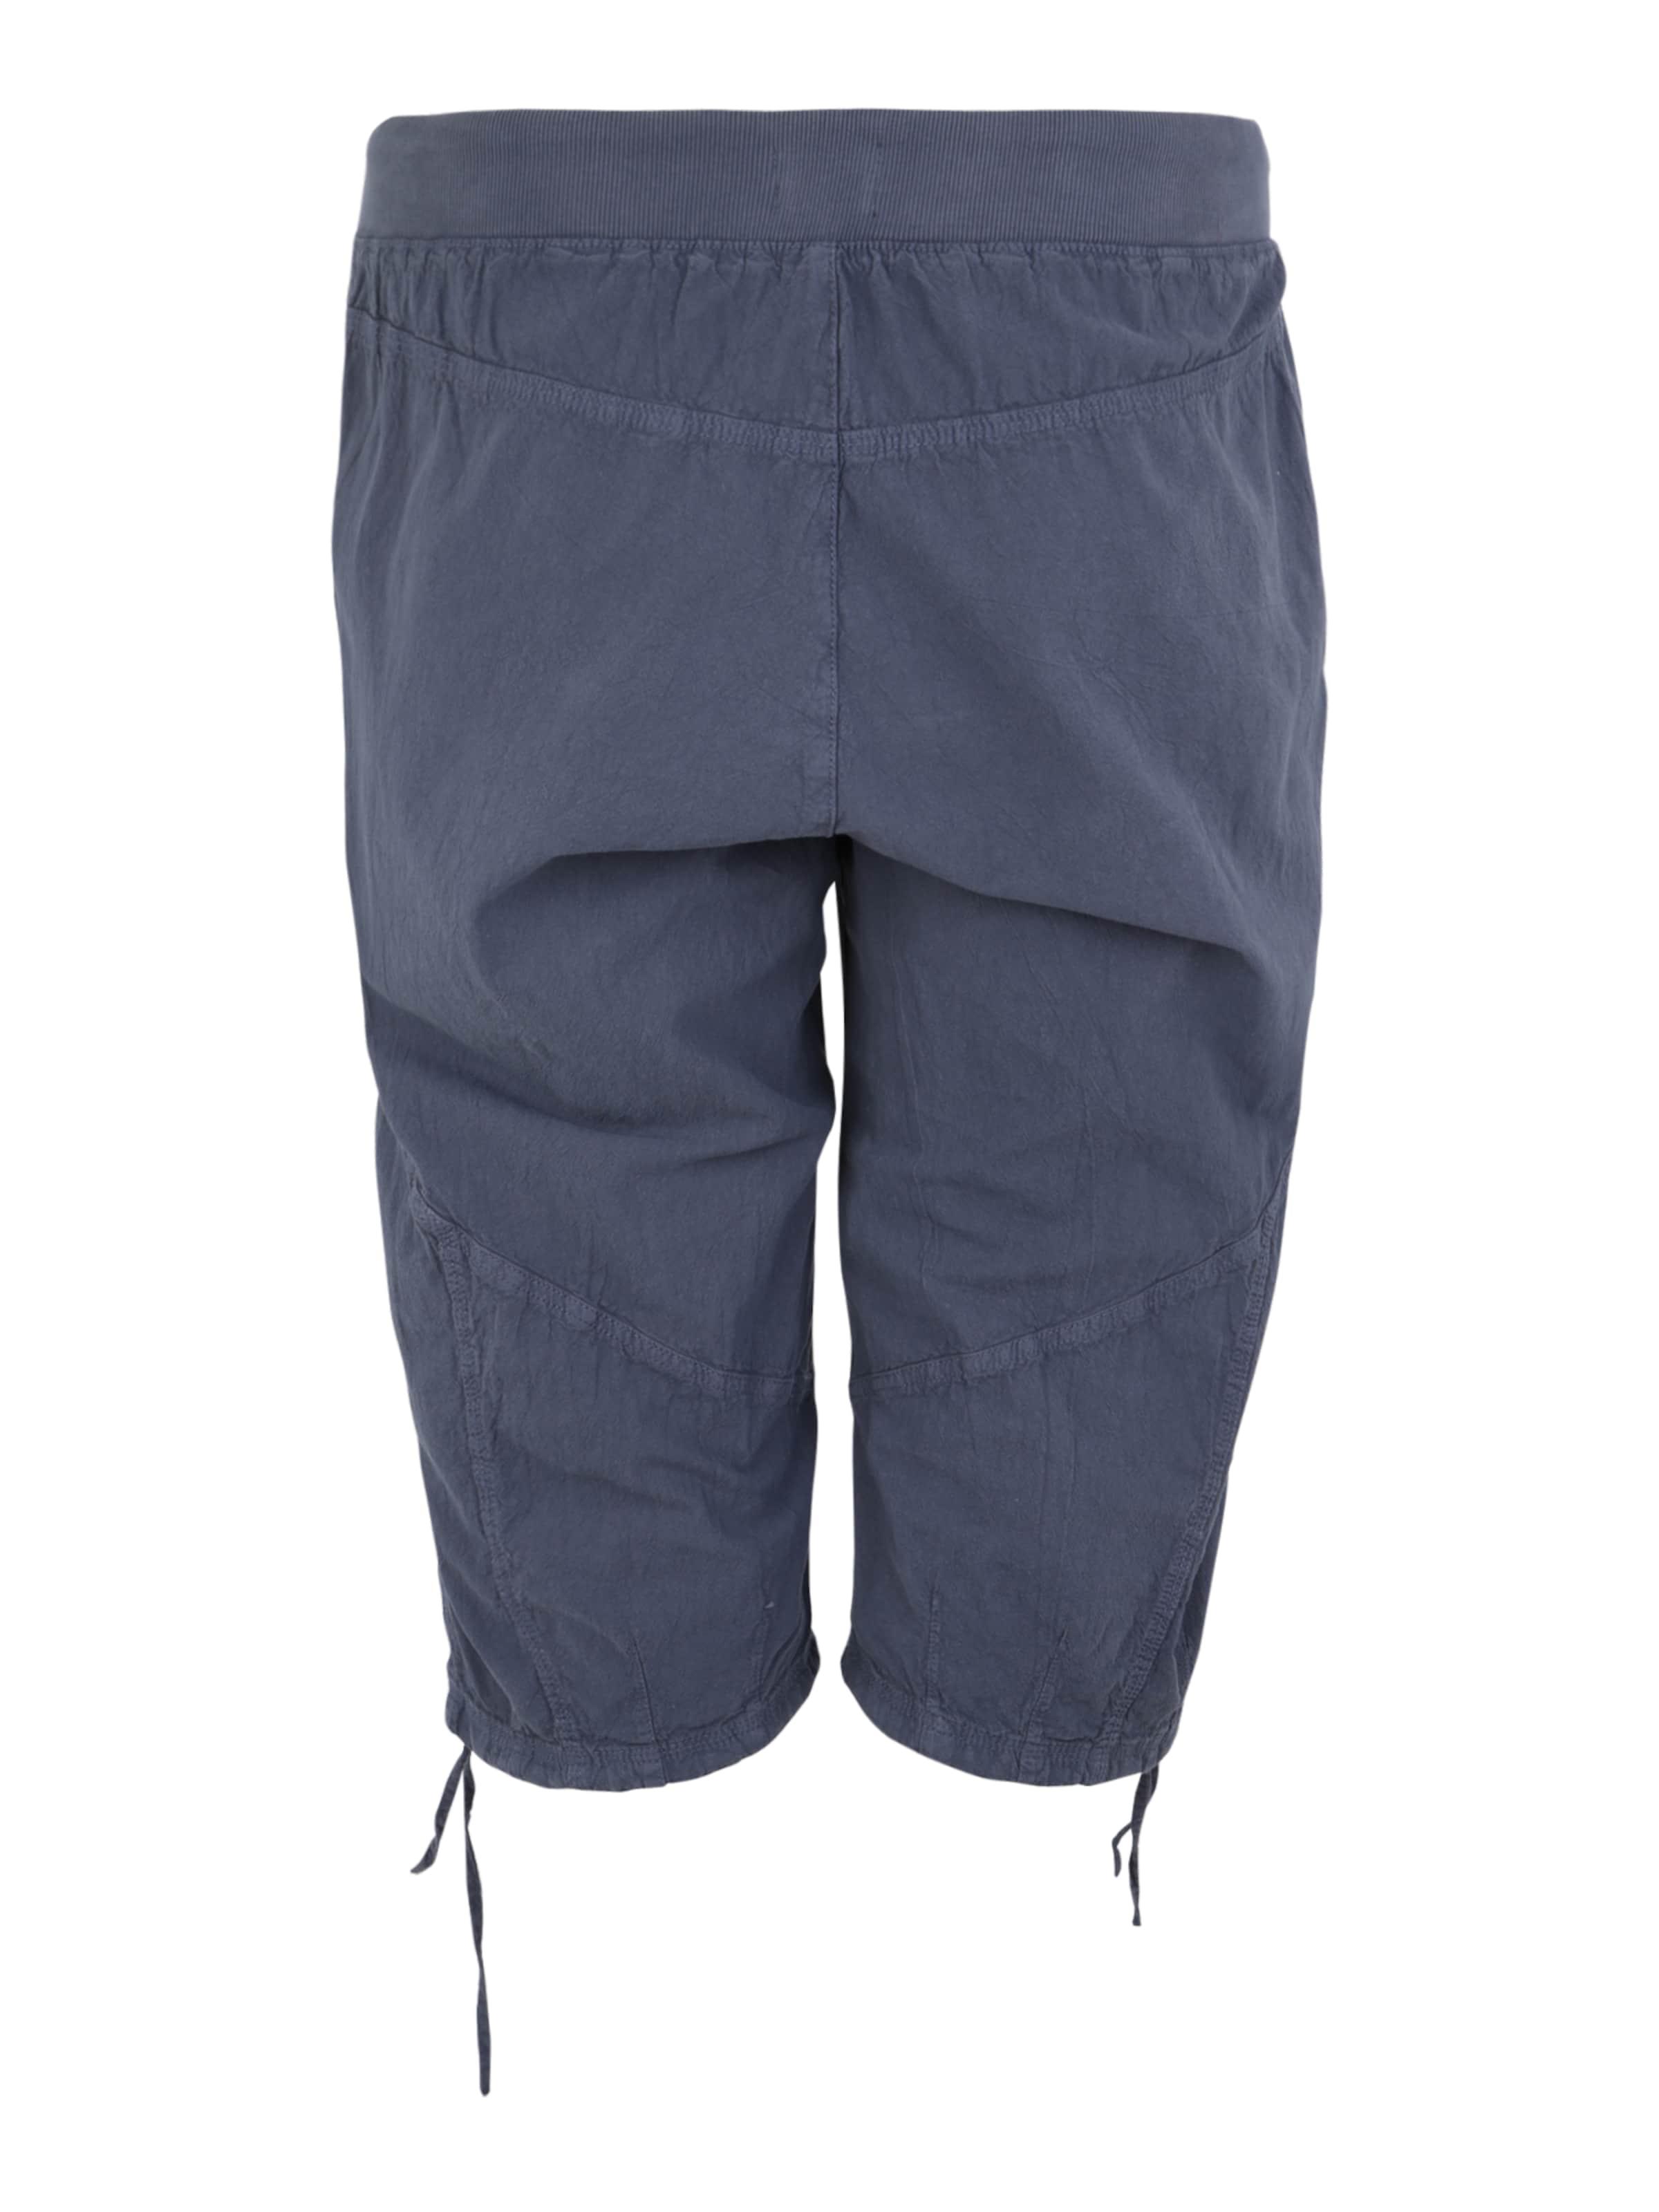 'mmarrakesh' Shorts 'mmarrakesh' Zizzi In Violettblau Shorts Zizzi vmn0N8w